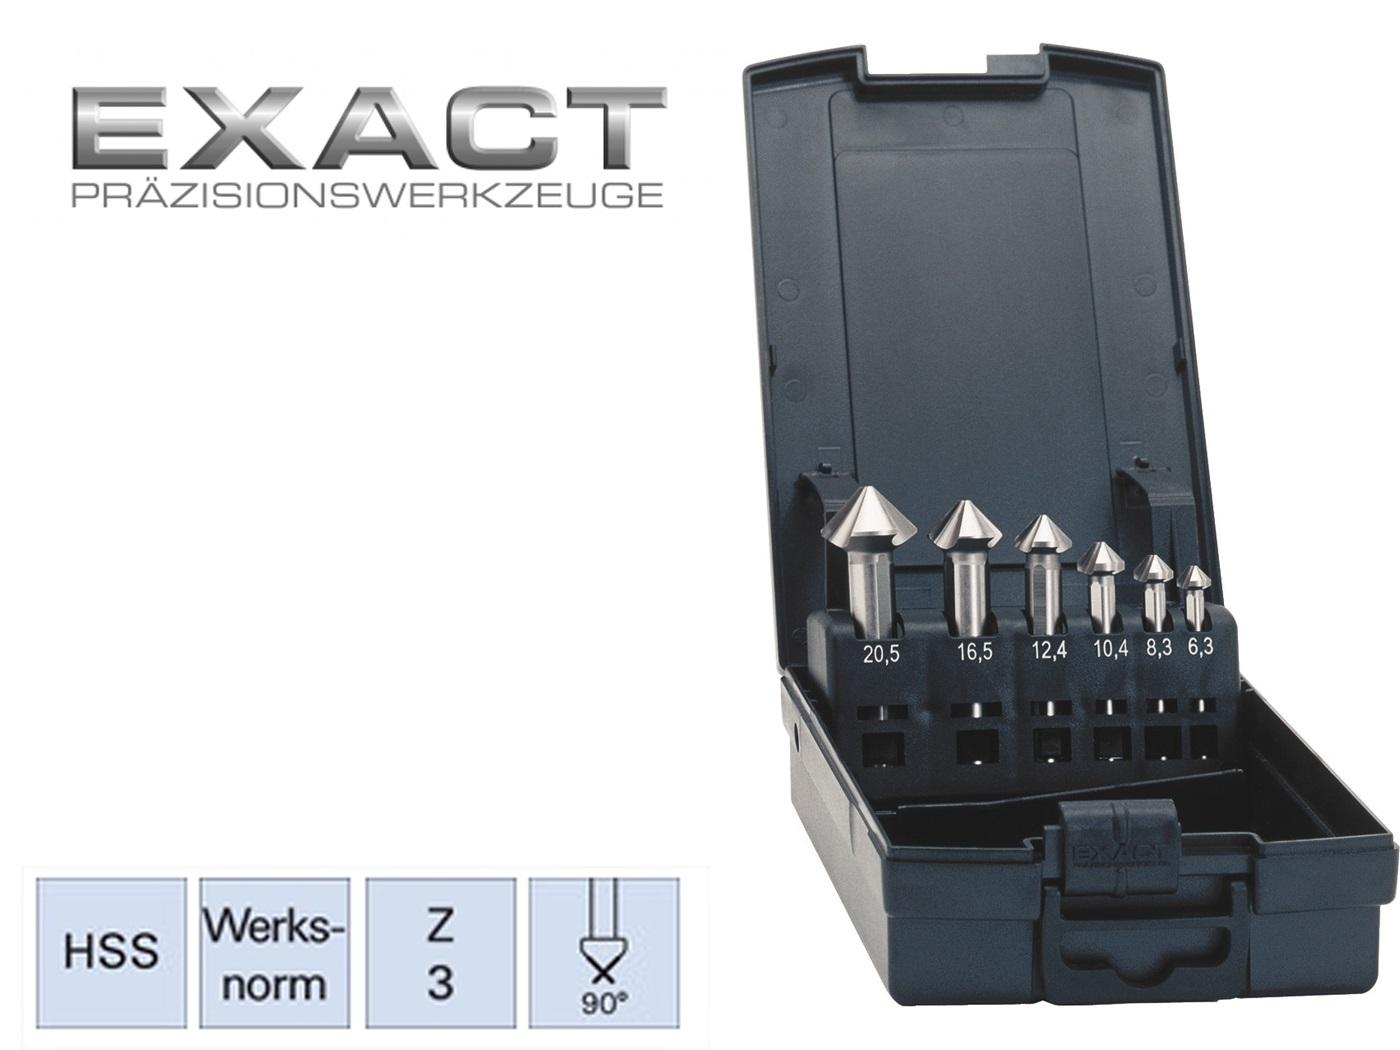 verzinkboor set DIN 335C HSS ADVANCED exact   DKMTools - DKM Tools